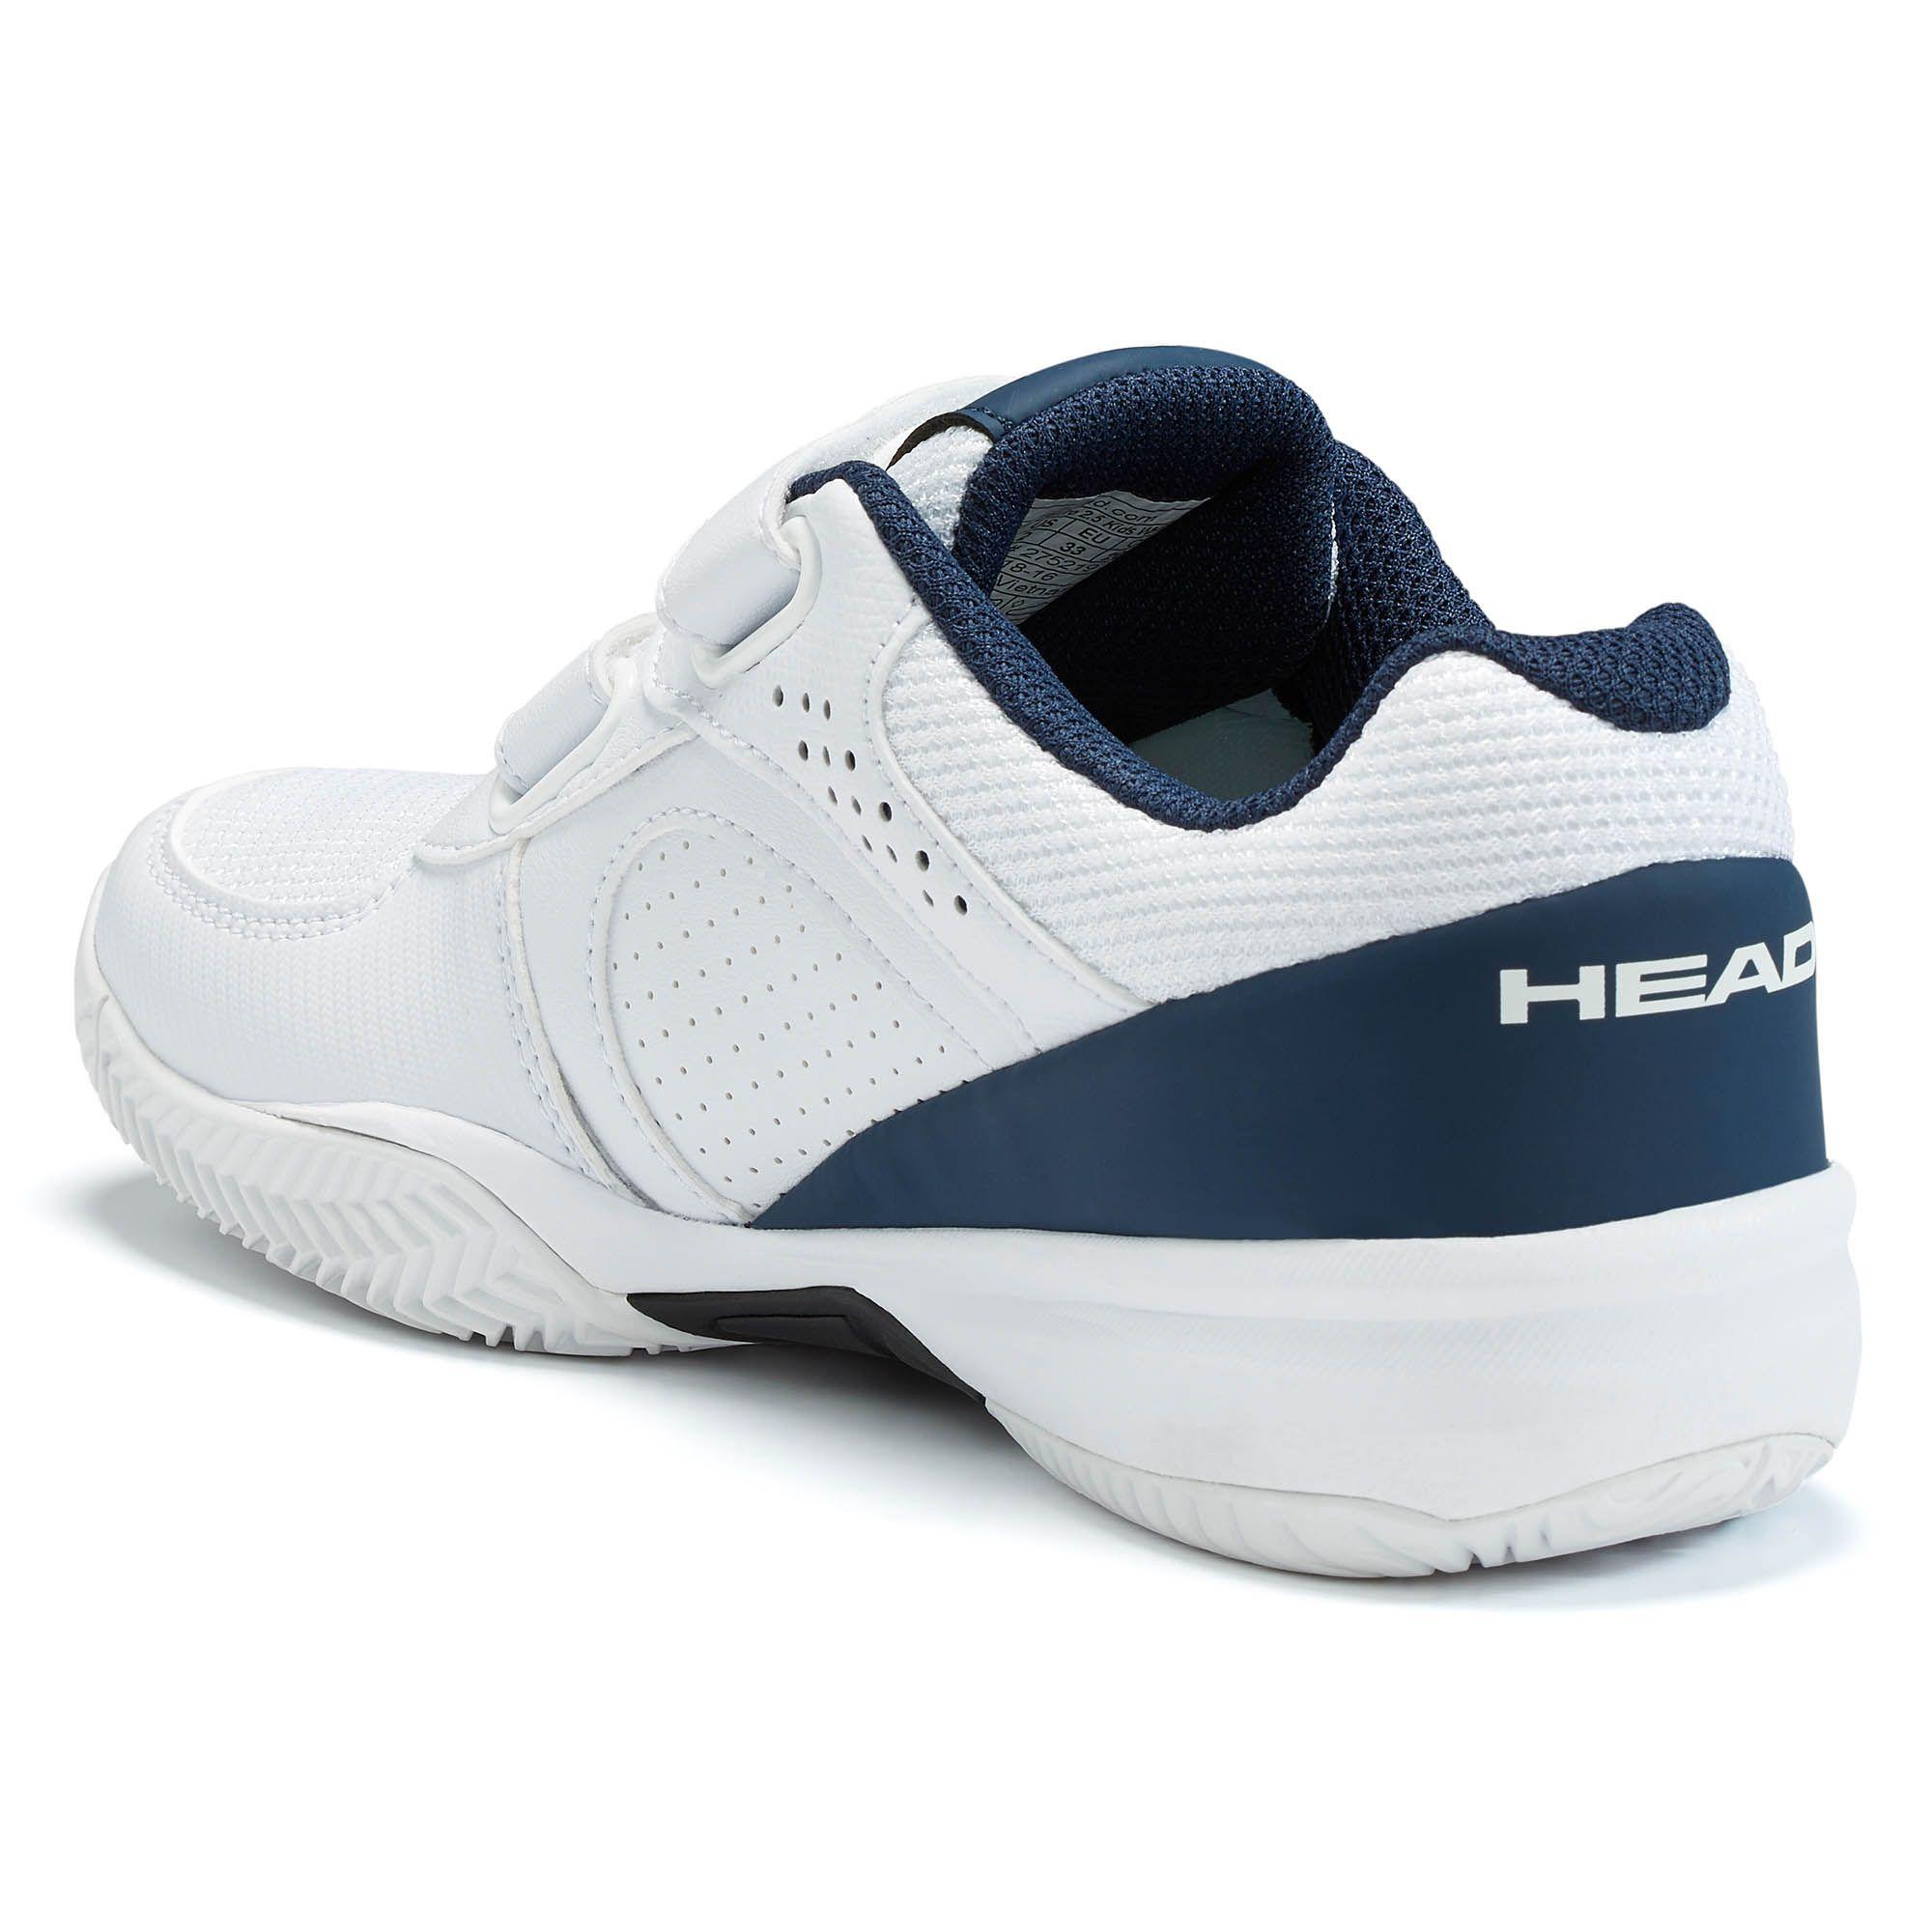 Mizuno Wave Inspire 10 Ladies Running Shoes - Sweatband.com